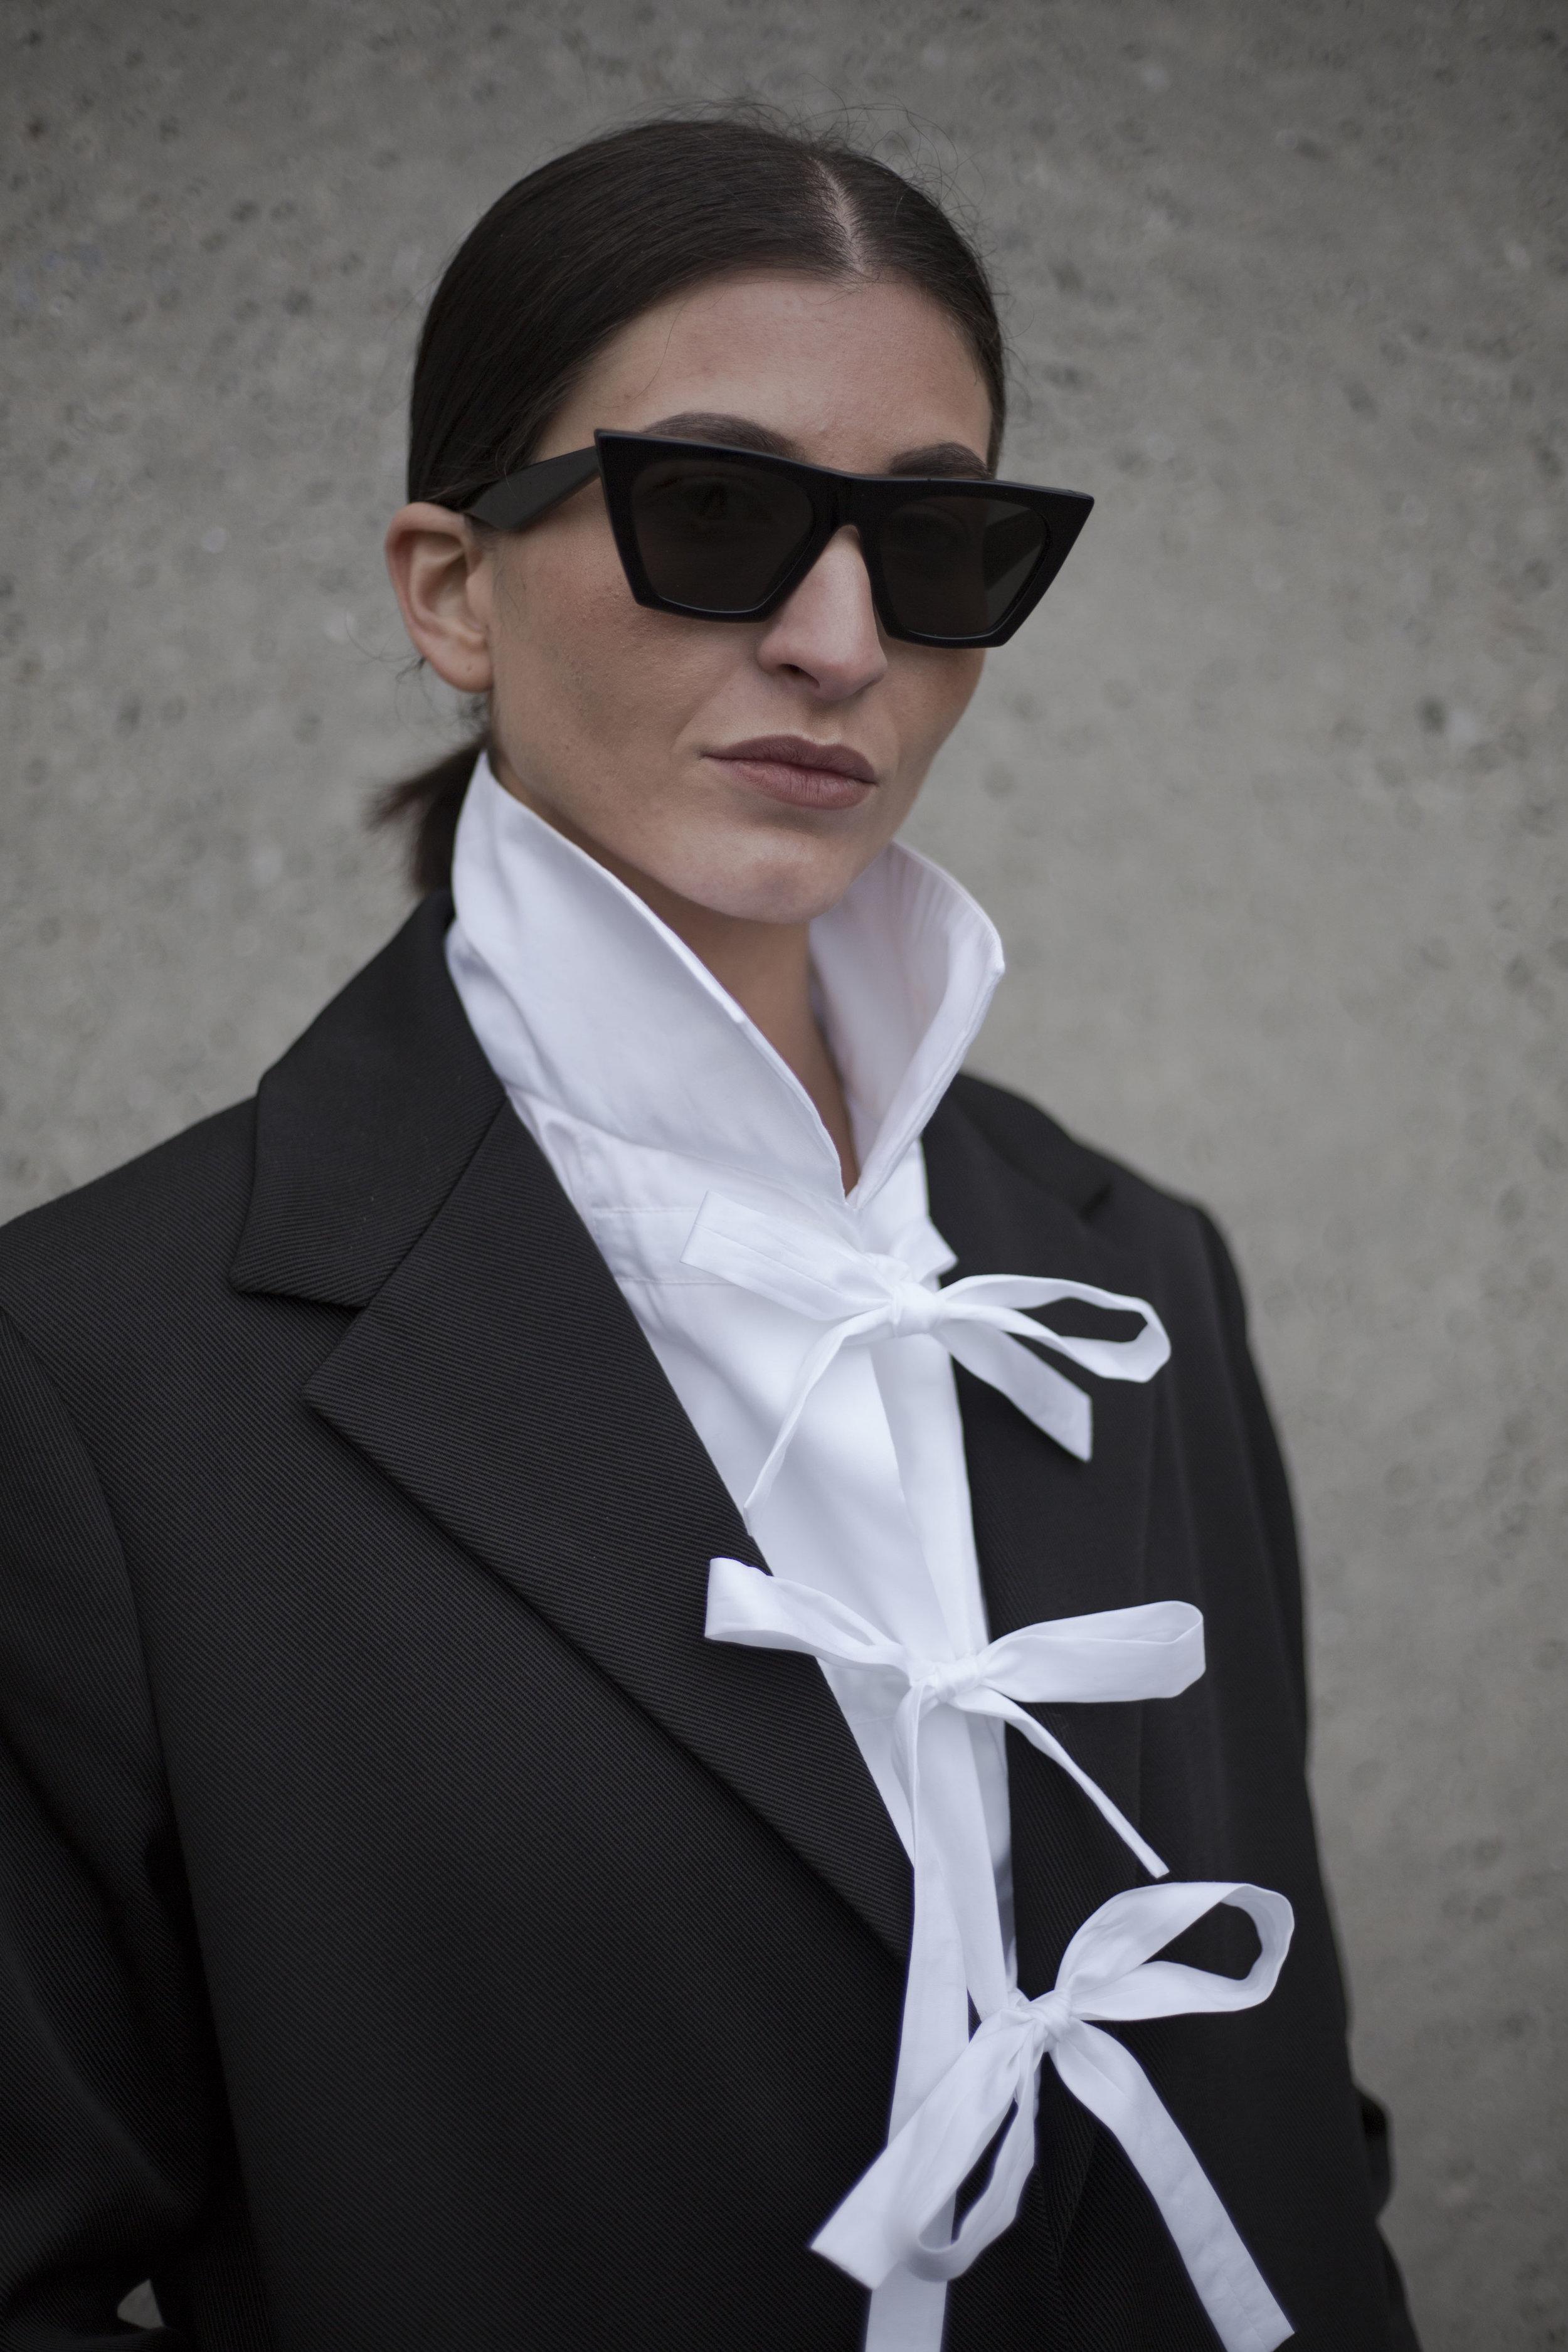 katarina-petrovic-copenhagen-fashion-week-scandinavian-street-style-streetstyle-thestreetland-fashion-best-style.jpg